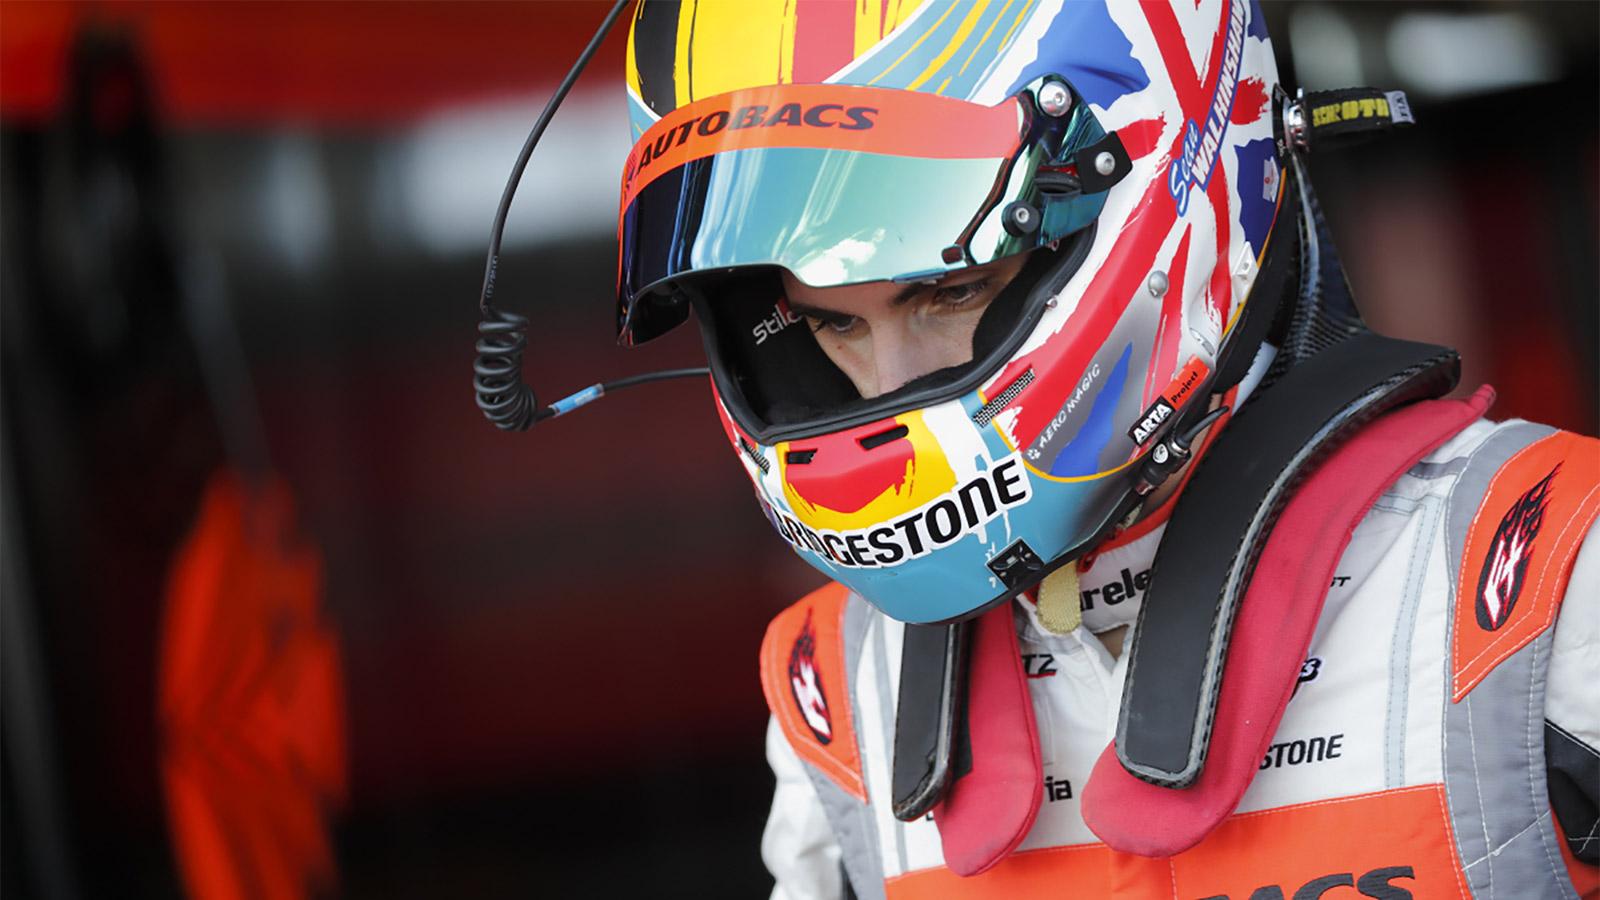 Sean Walkinshaw determined to make podium return in Rd8.